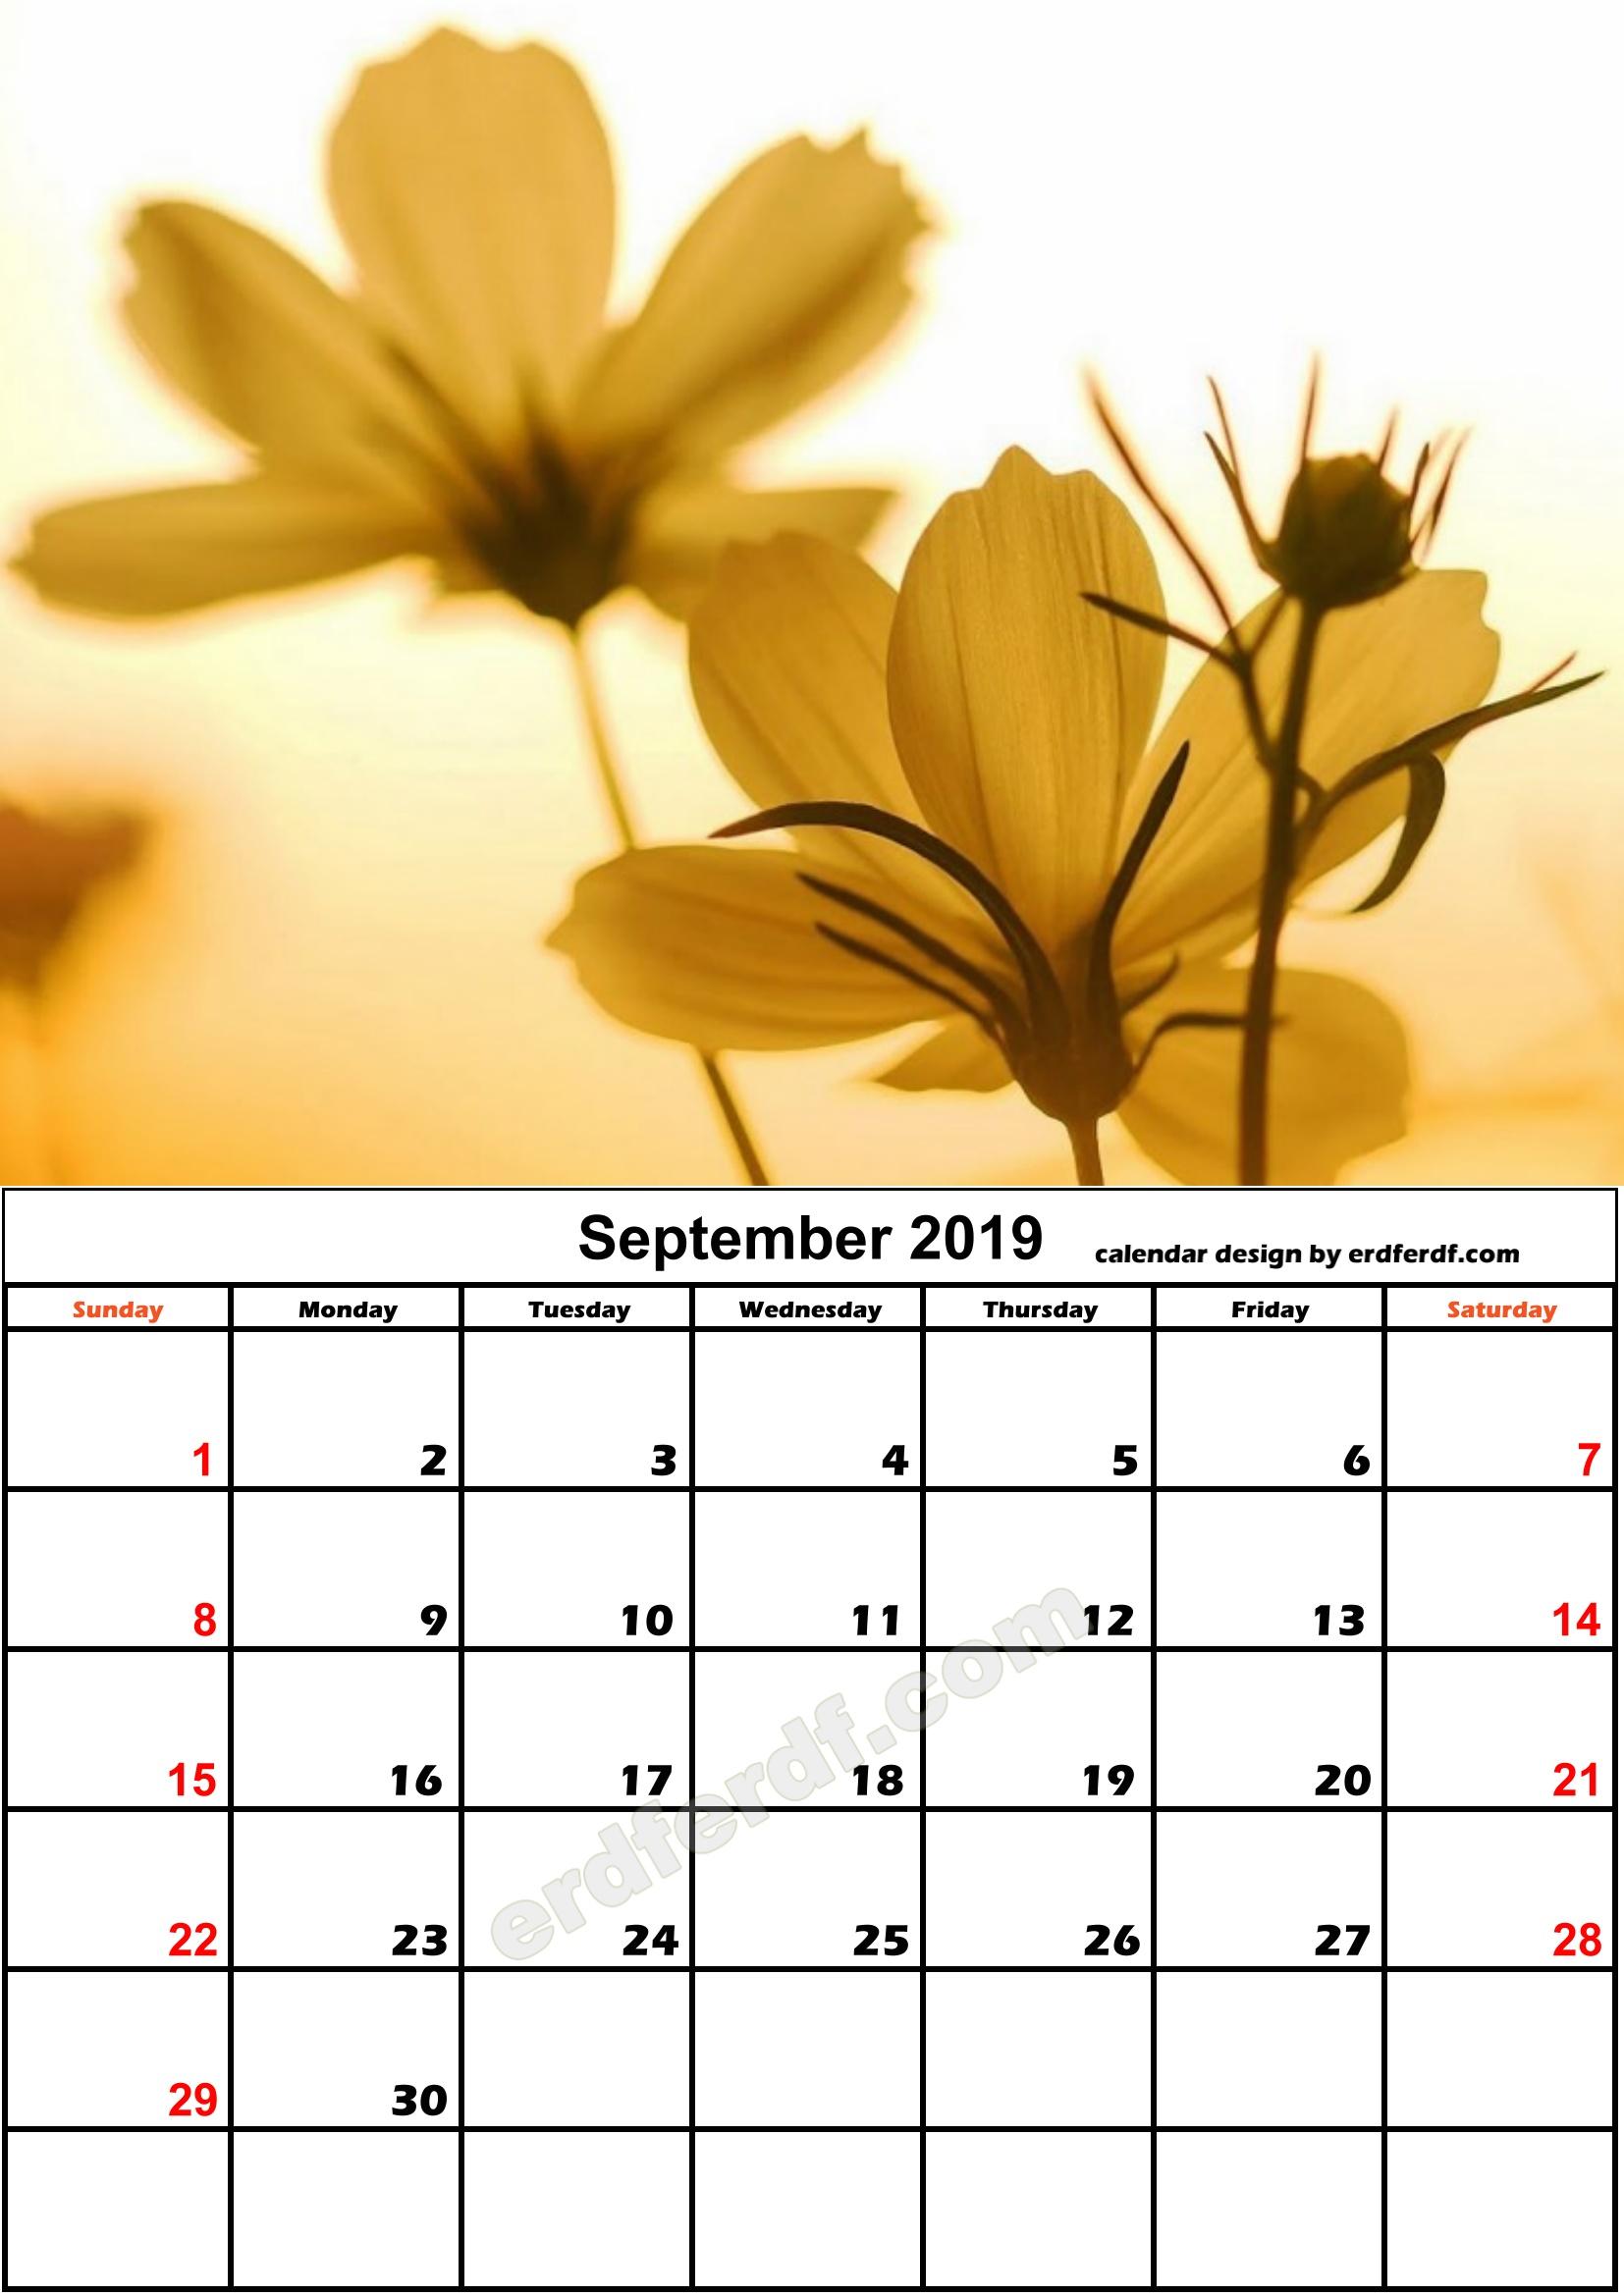 9 September Flower Nature Calendar Monthly 2019 Free Download